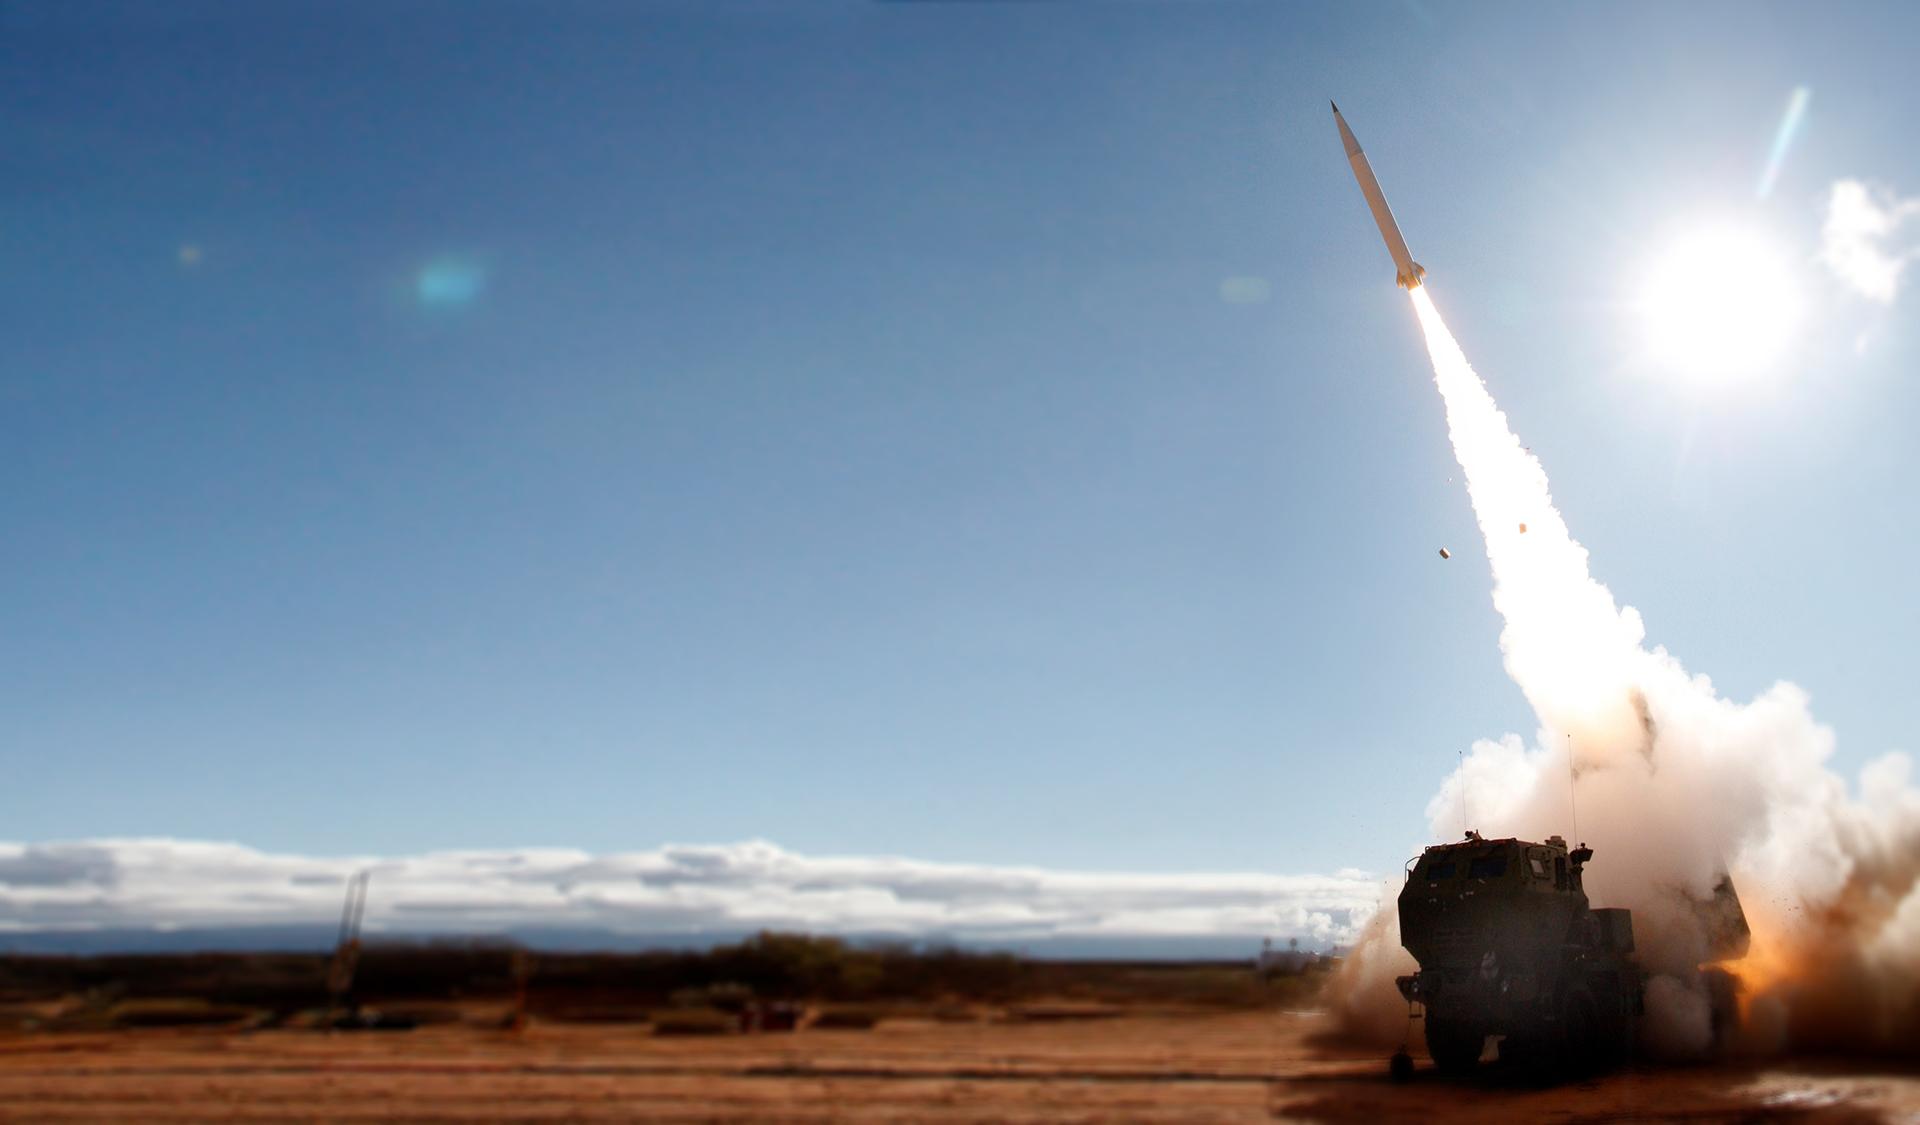 U.S. Army's PrSM Moves Towards Breaching Defunct INF Treaty's Limits